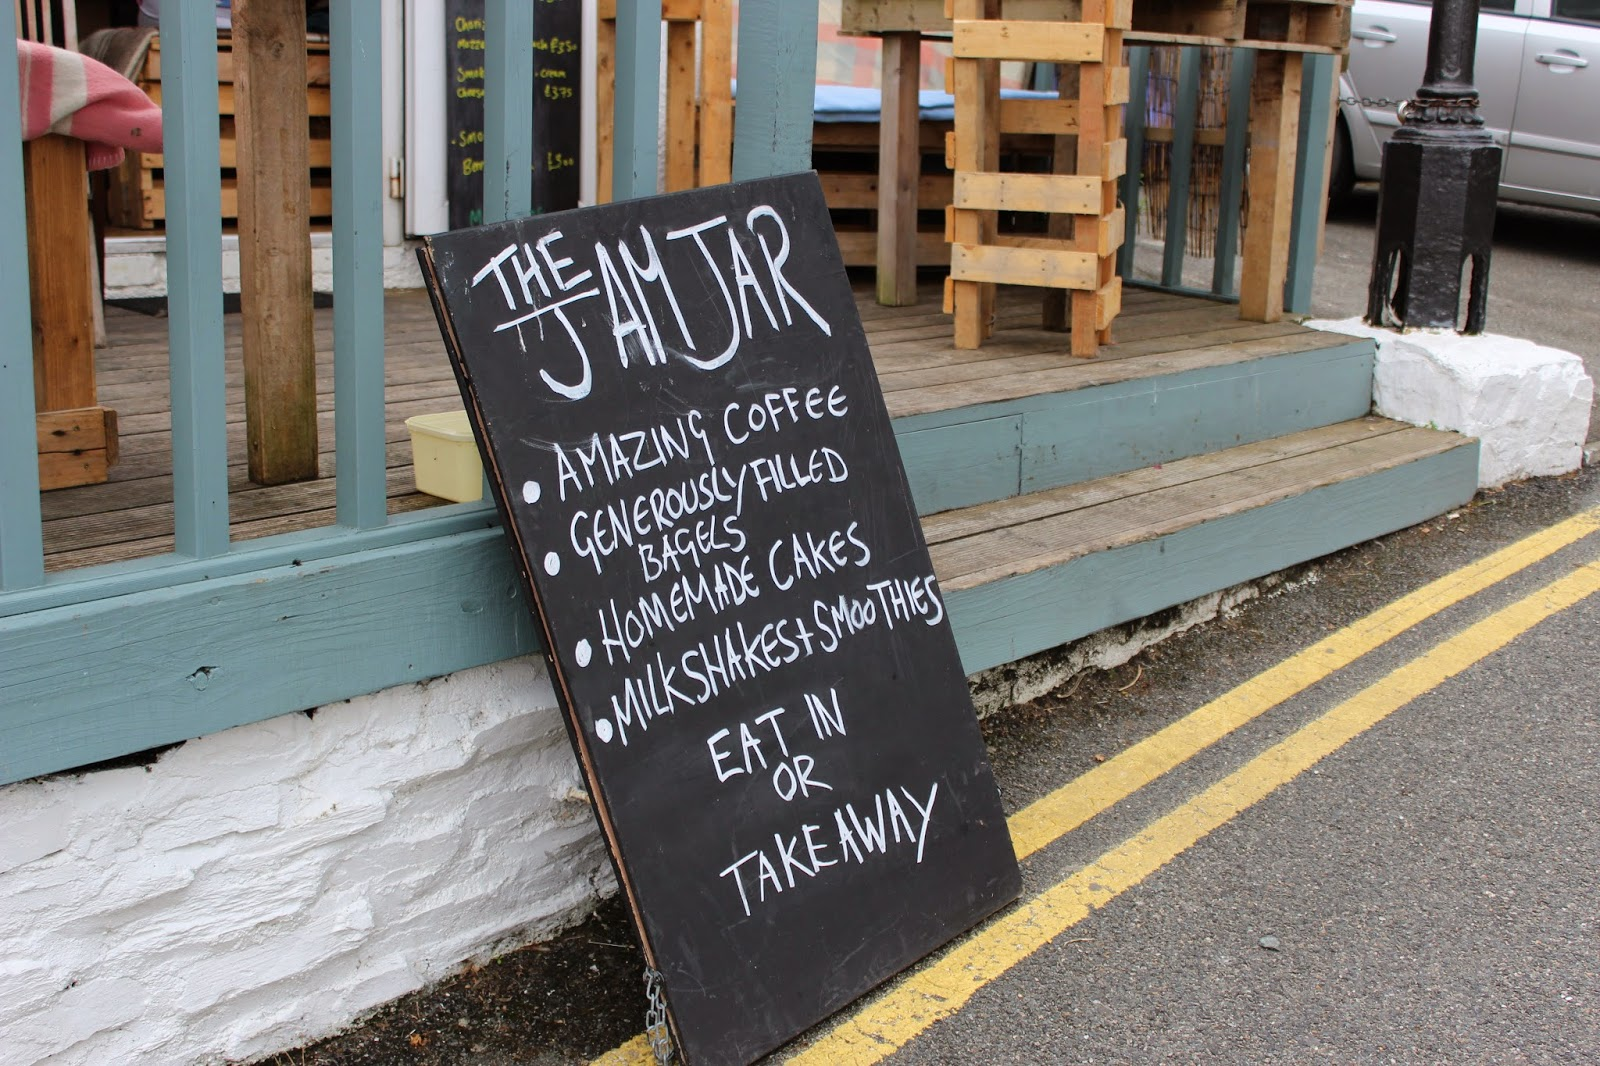 The-Jam-Jar-Newquay